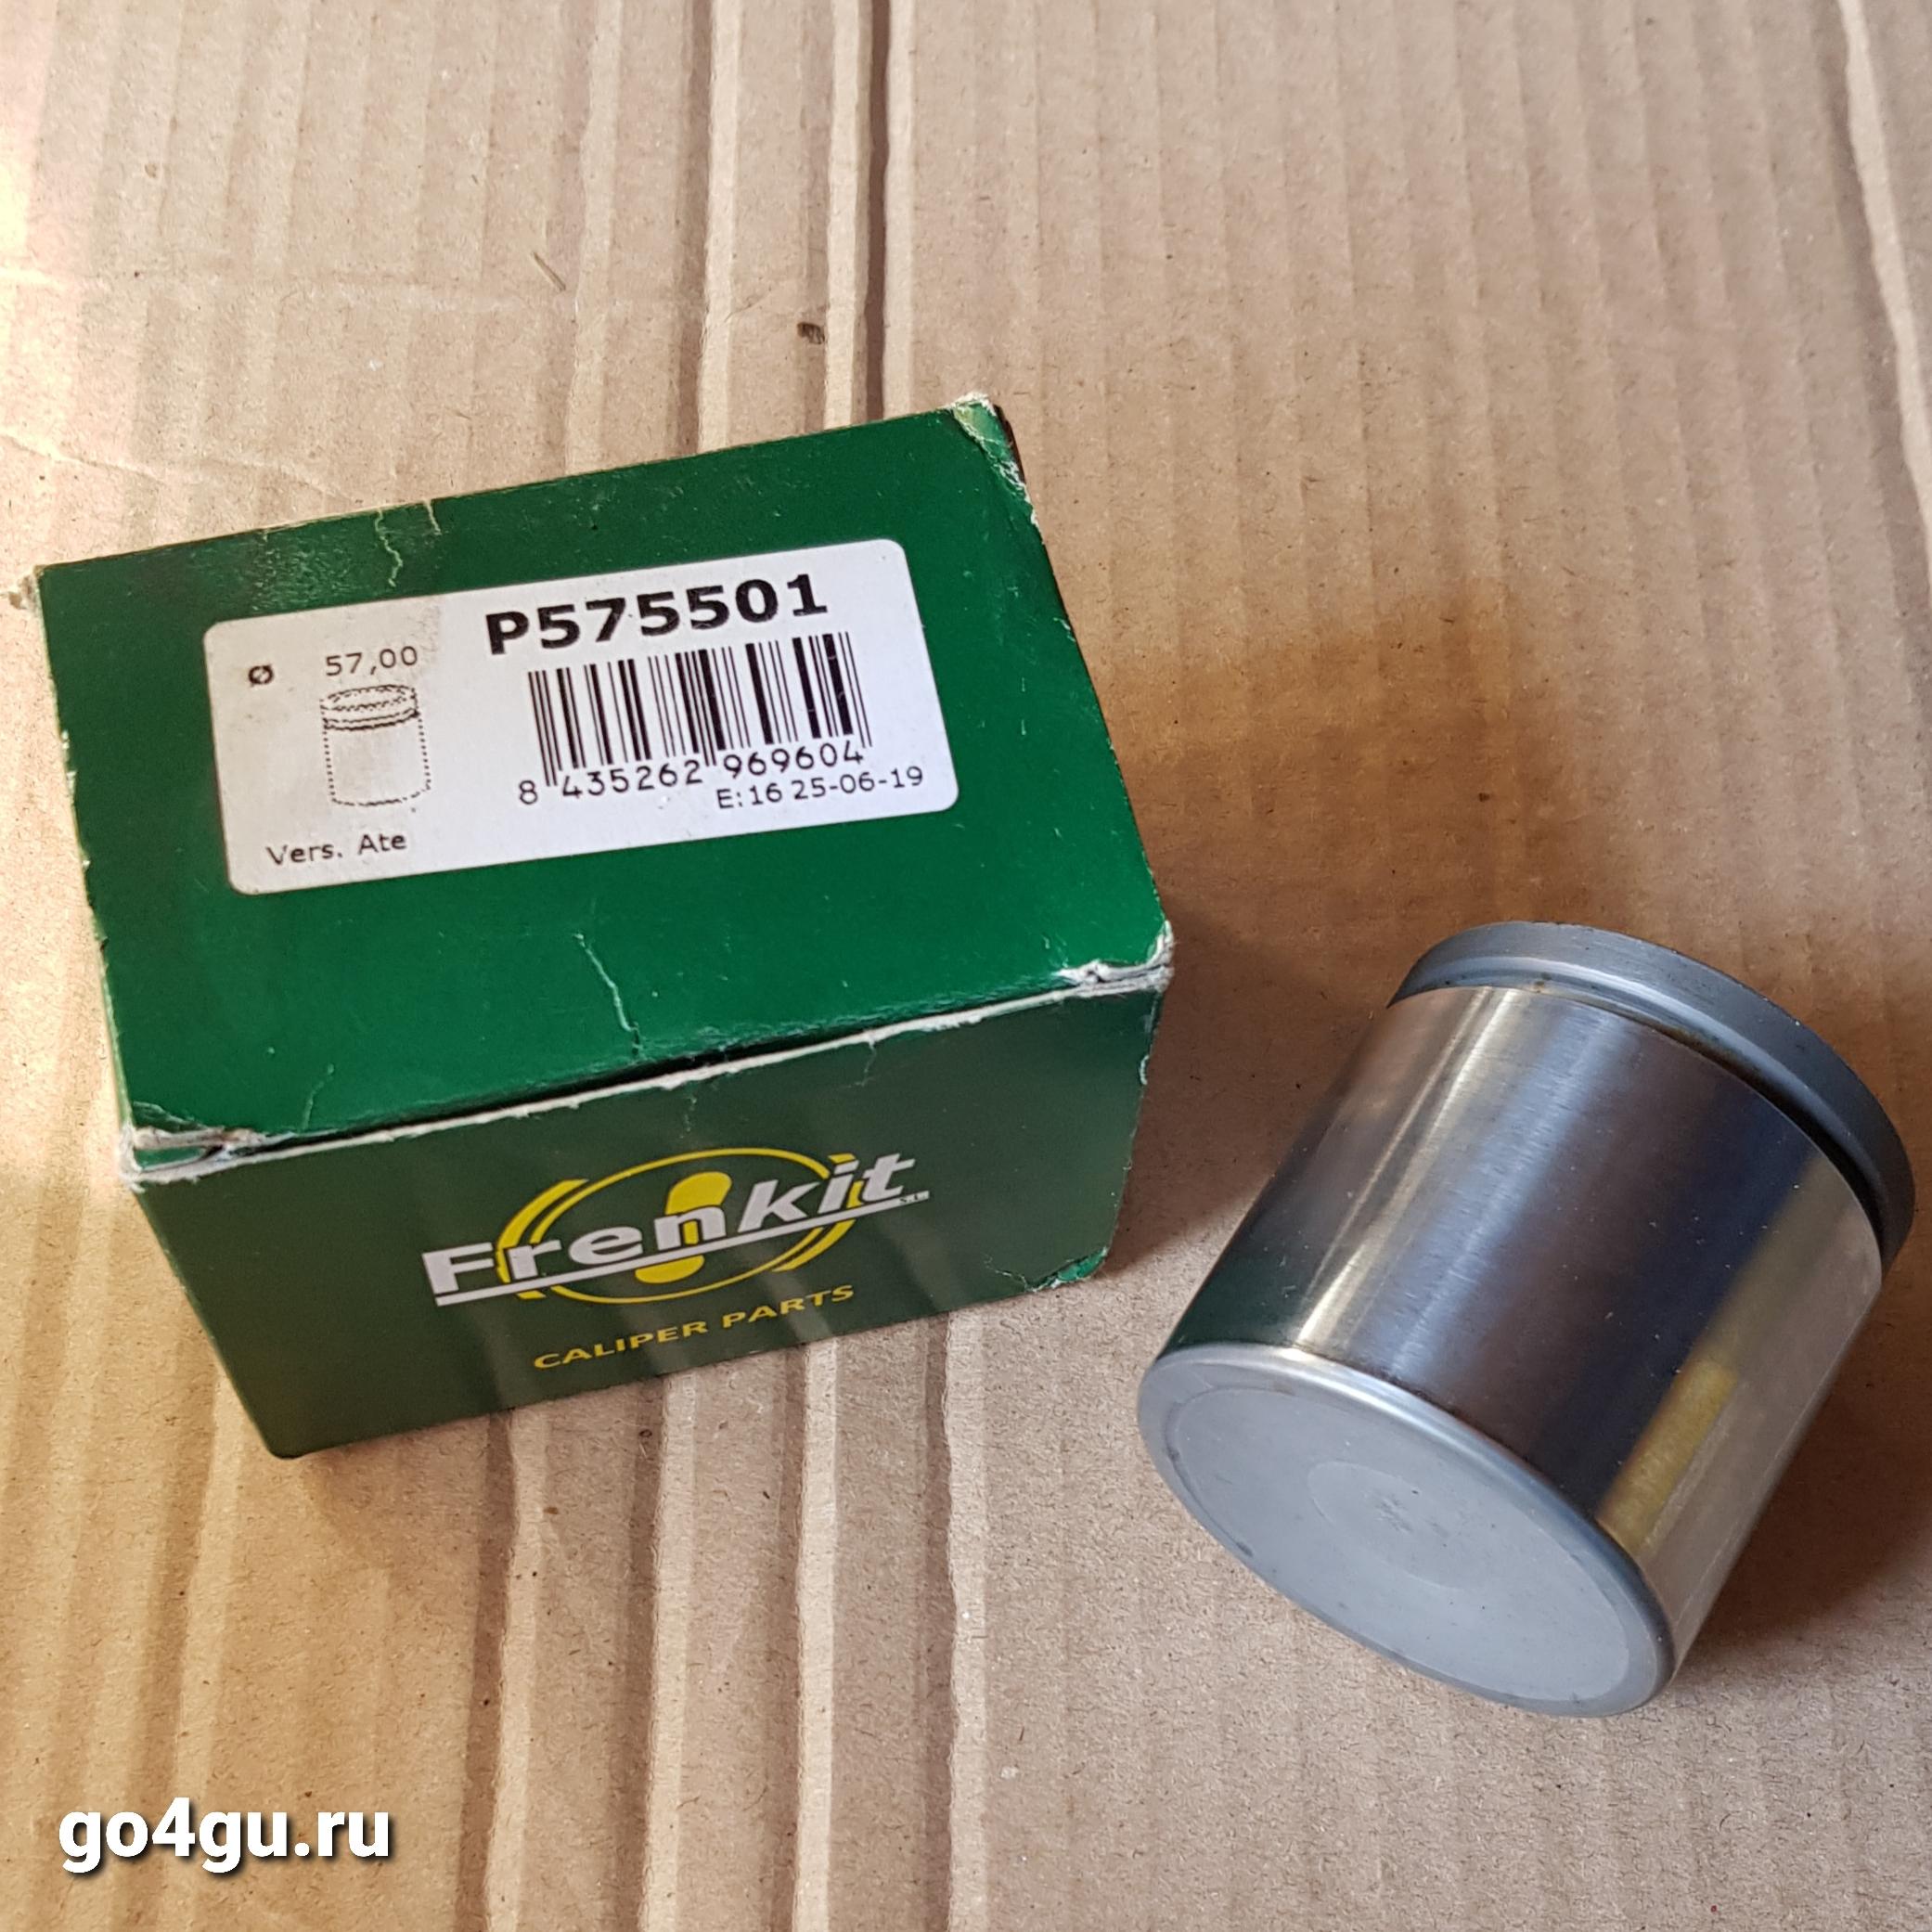 Frenkit P575501